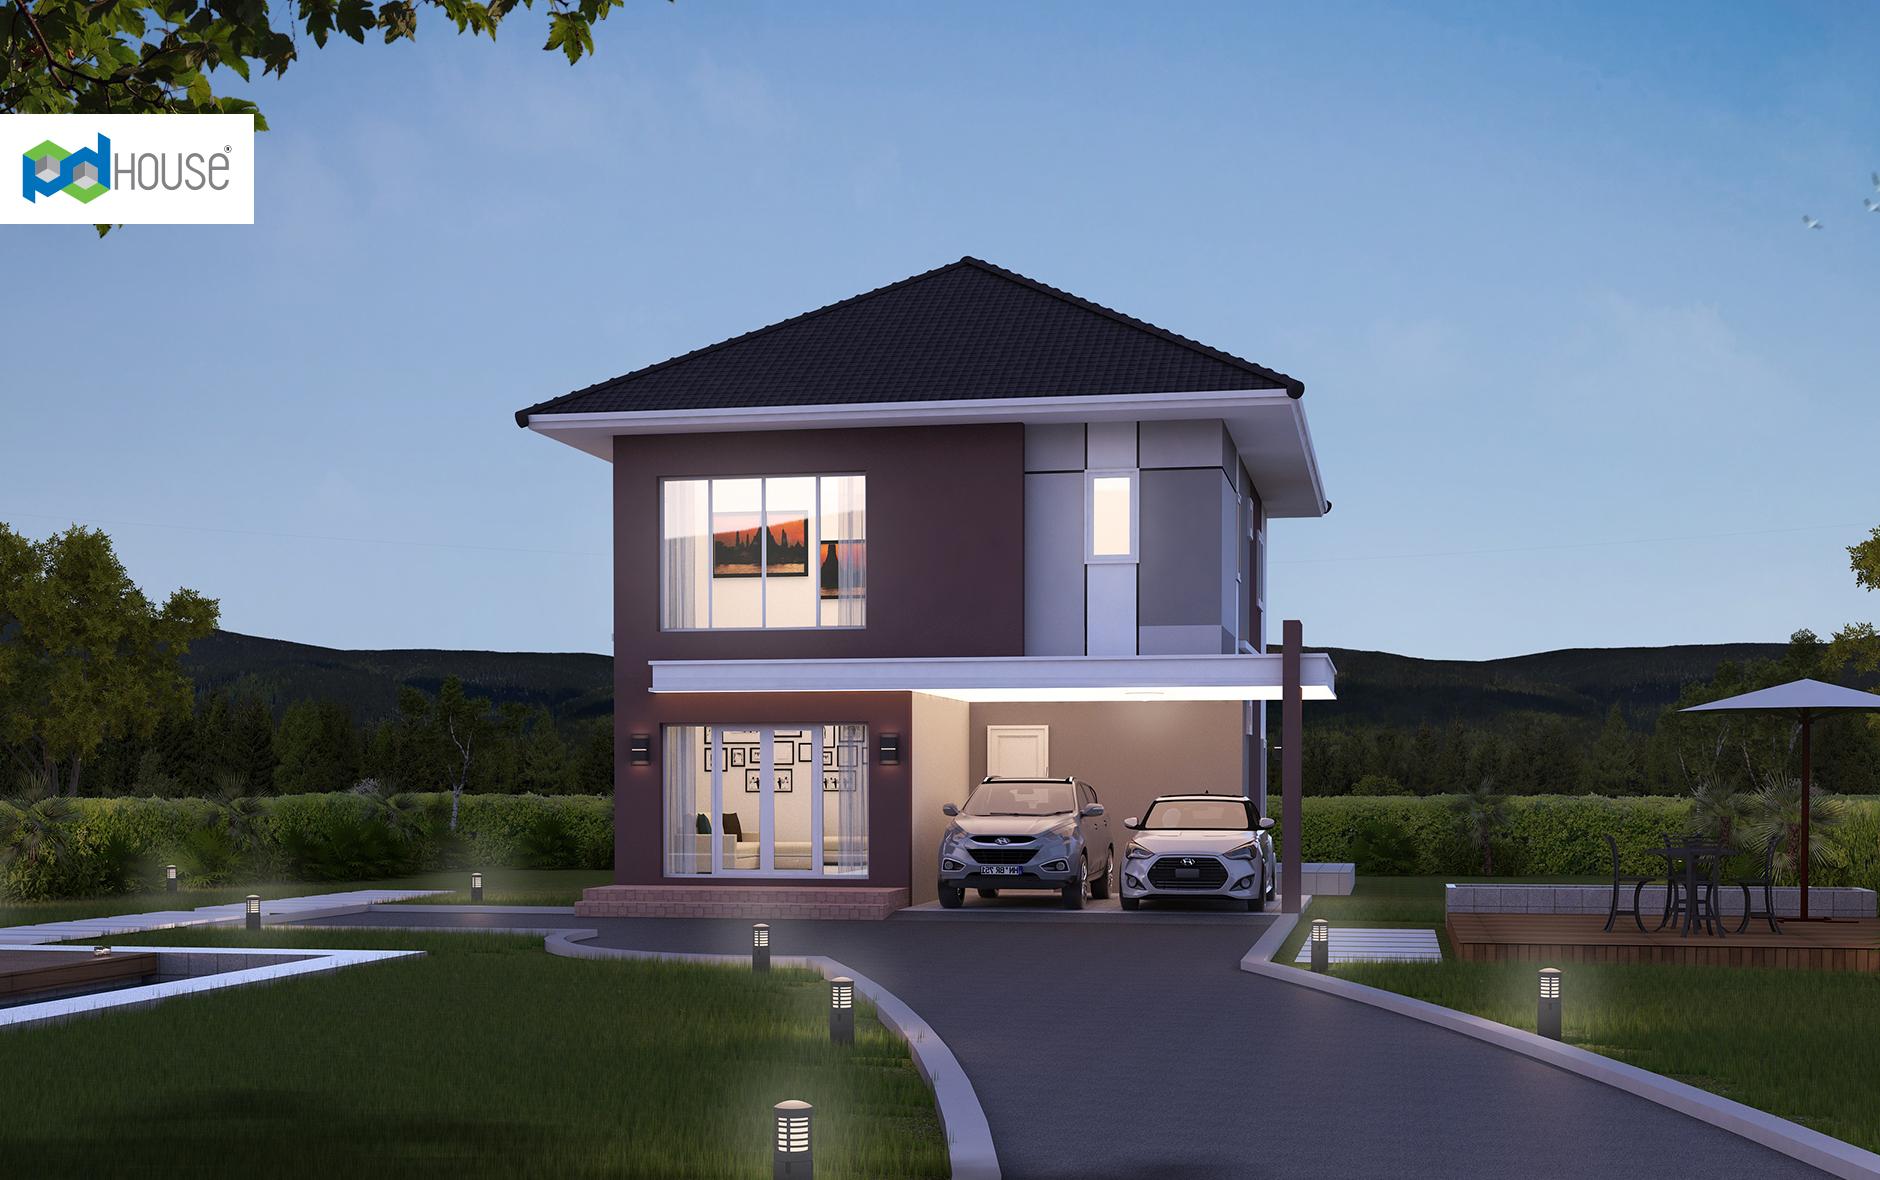 Simple House Design 13x14 meter 43x46 feet 4 Bedrooms 1